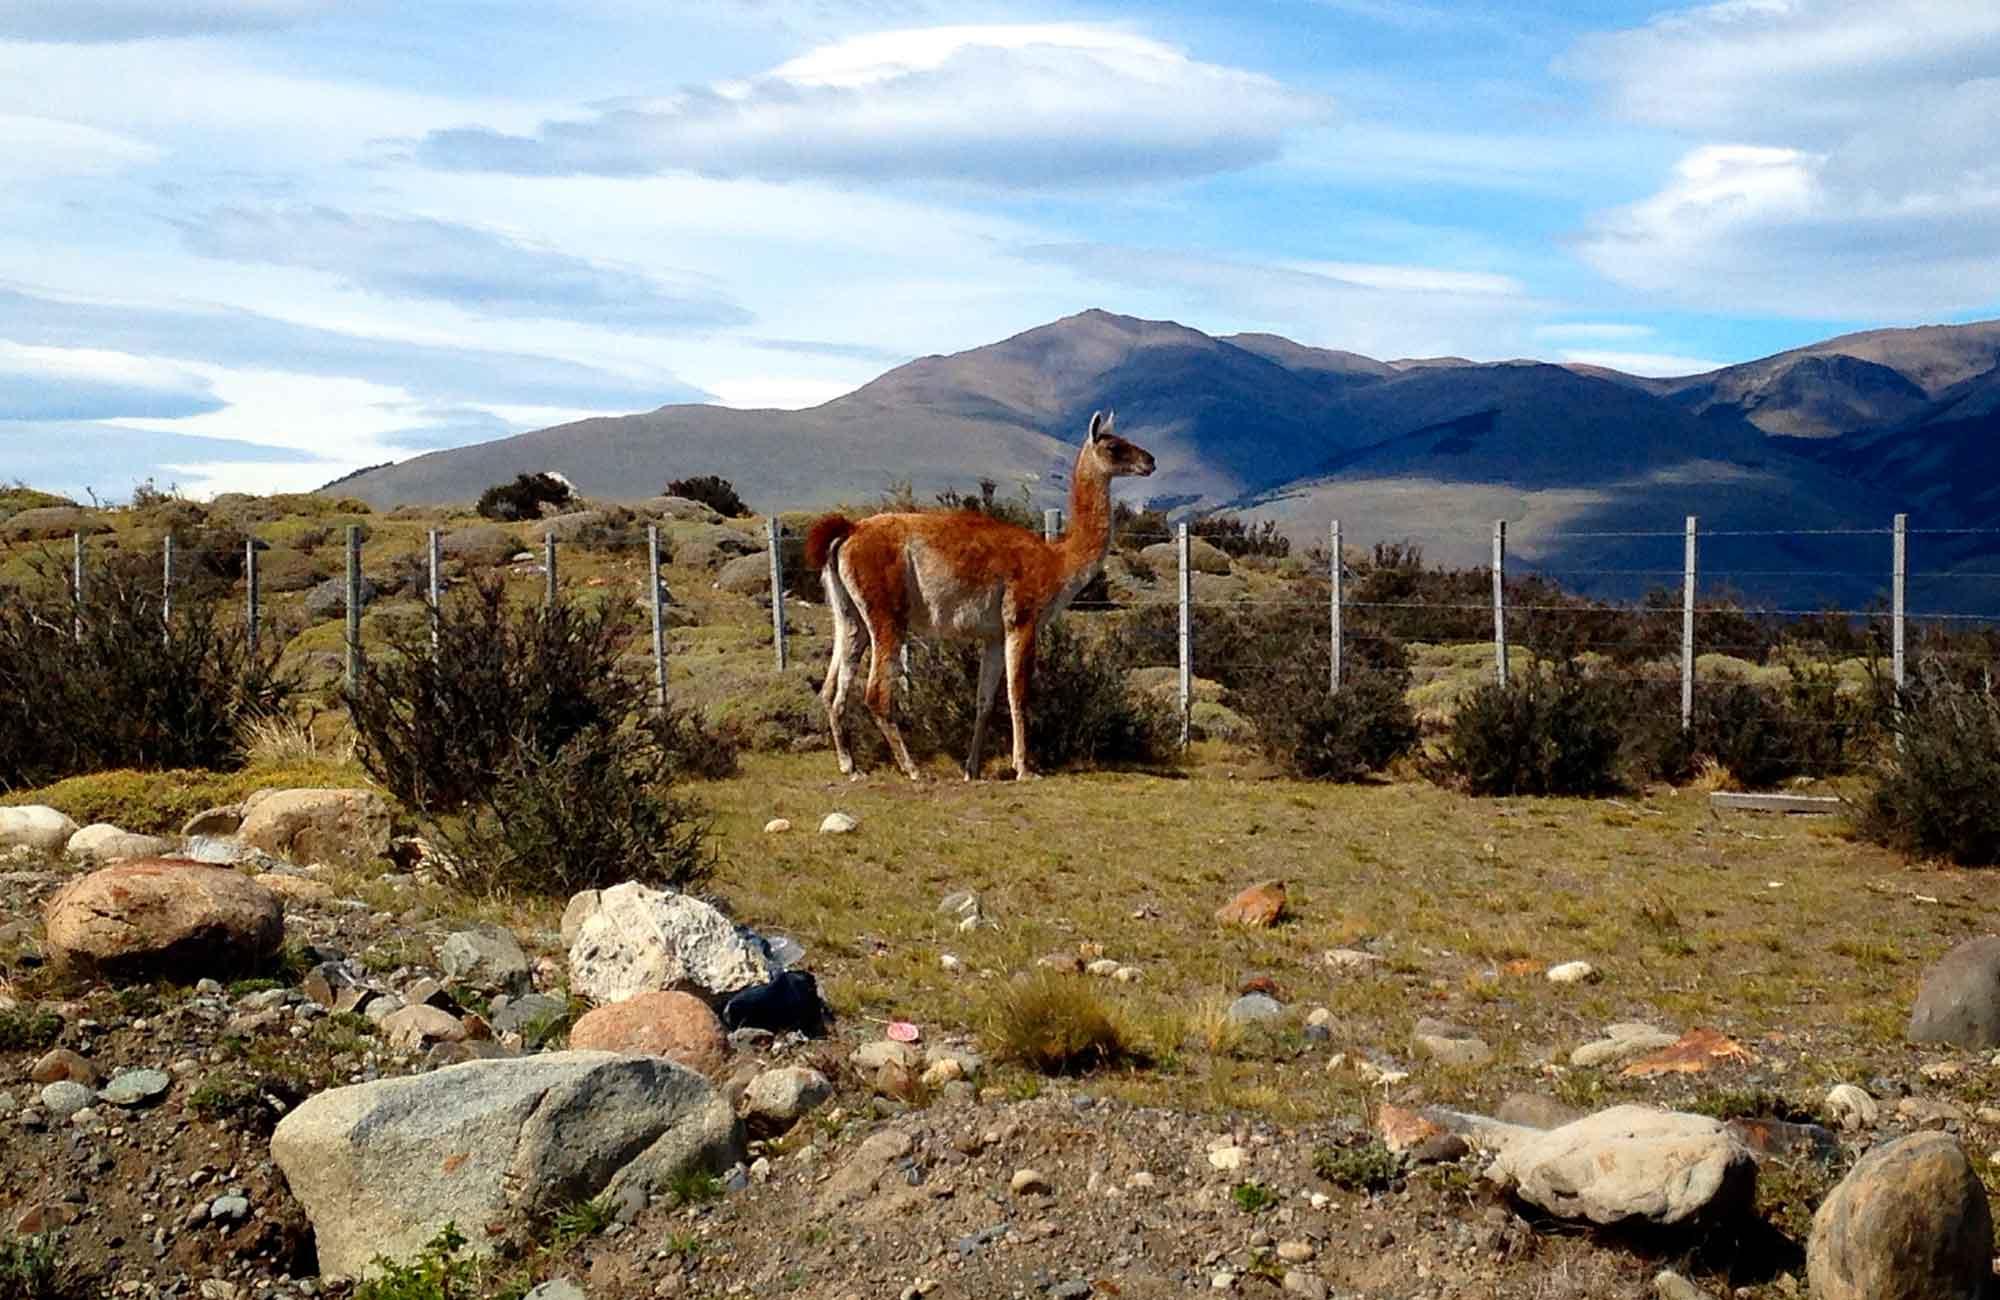 Voyage Chili - Guanaco - Amplitudes